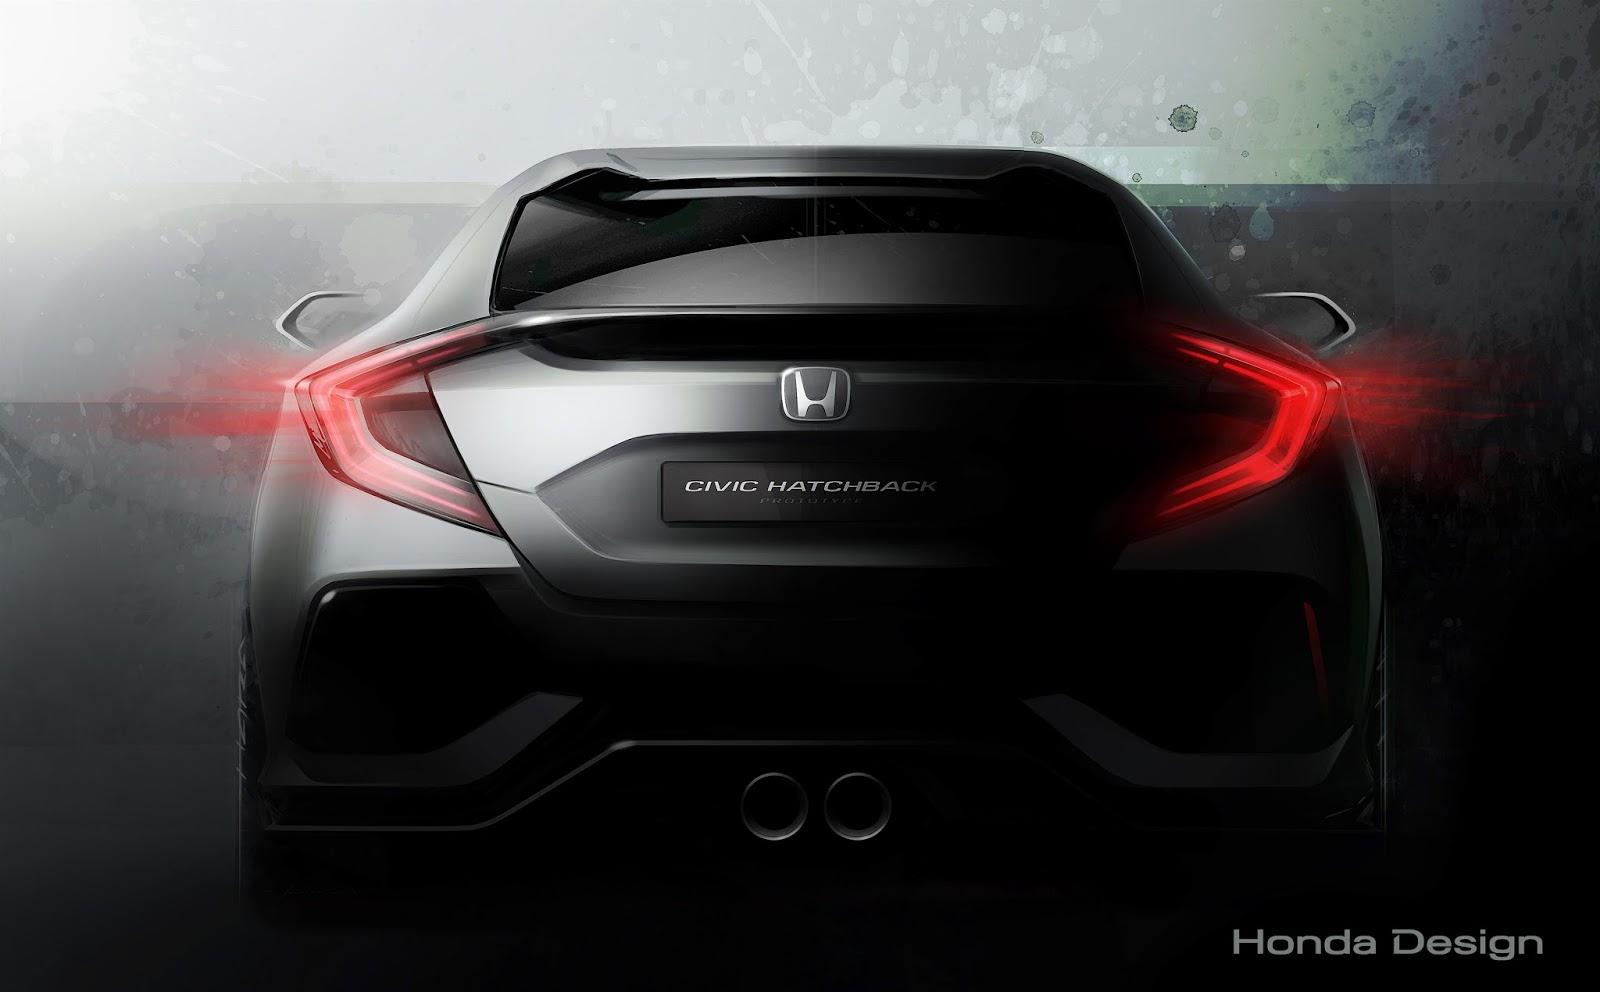 71160 Civic Hatchback Prototype%2B%25281%2529 Η Honda μας δείχνει (λίγο) από το νέο Civic autoshow, Honda, Honda Civic Hatchback Prototype, Honda Clarity Fuel Cell, Honda Jazz, Honda NSX, Prototype, Σαλόνι Αυτοκινήτου της Γενεύης